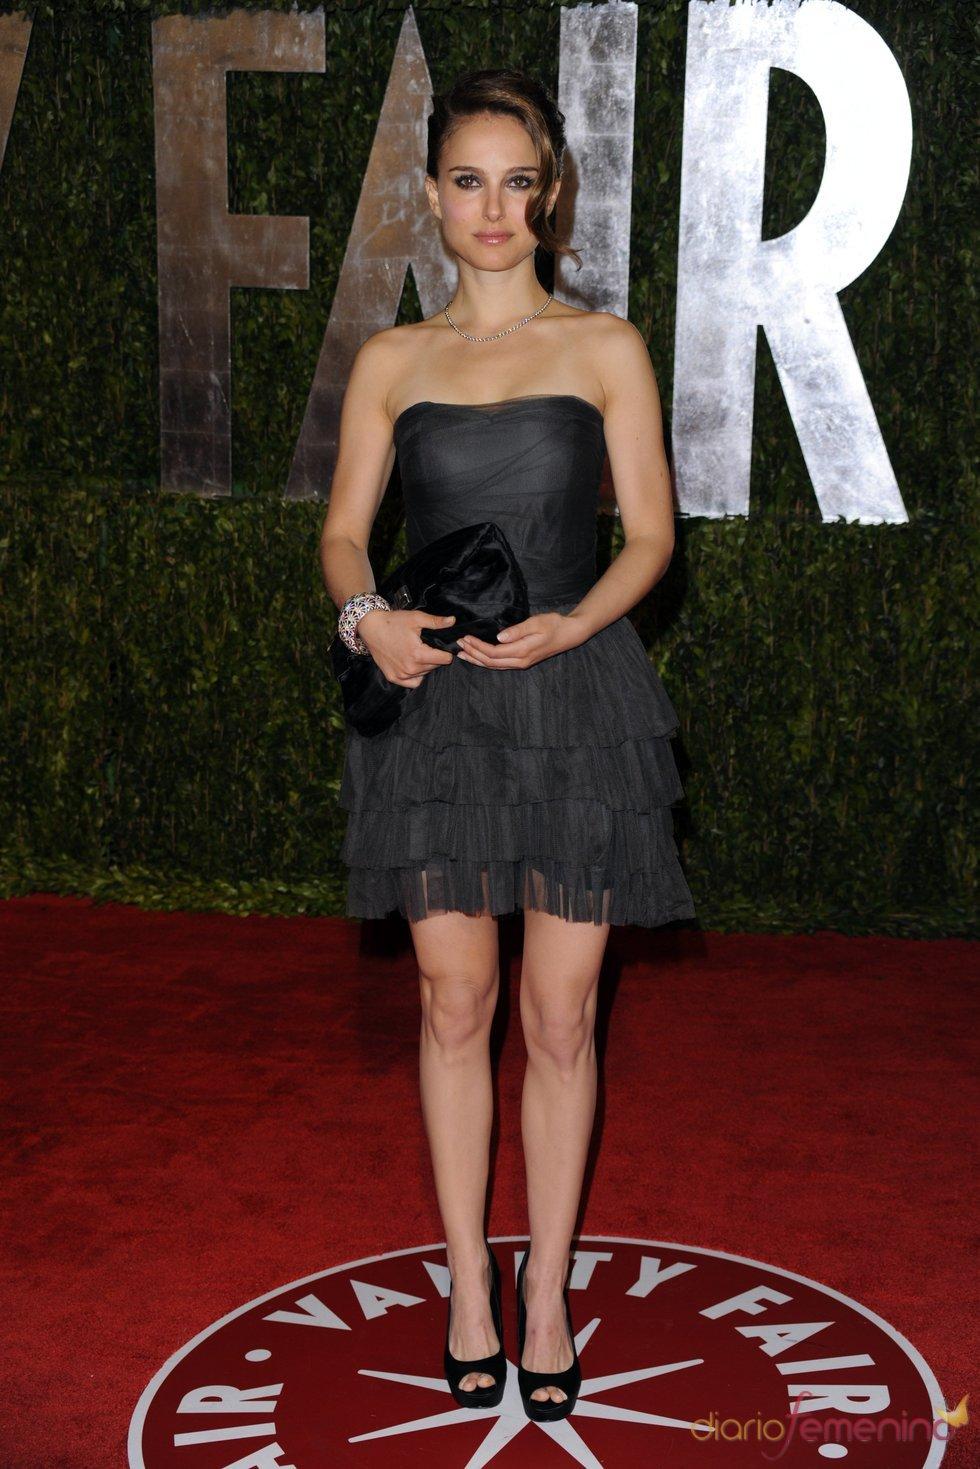 Natalie Portman en la fiesta Vanity Fair Oscar 2010